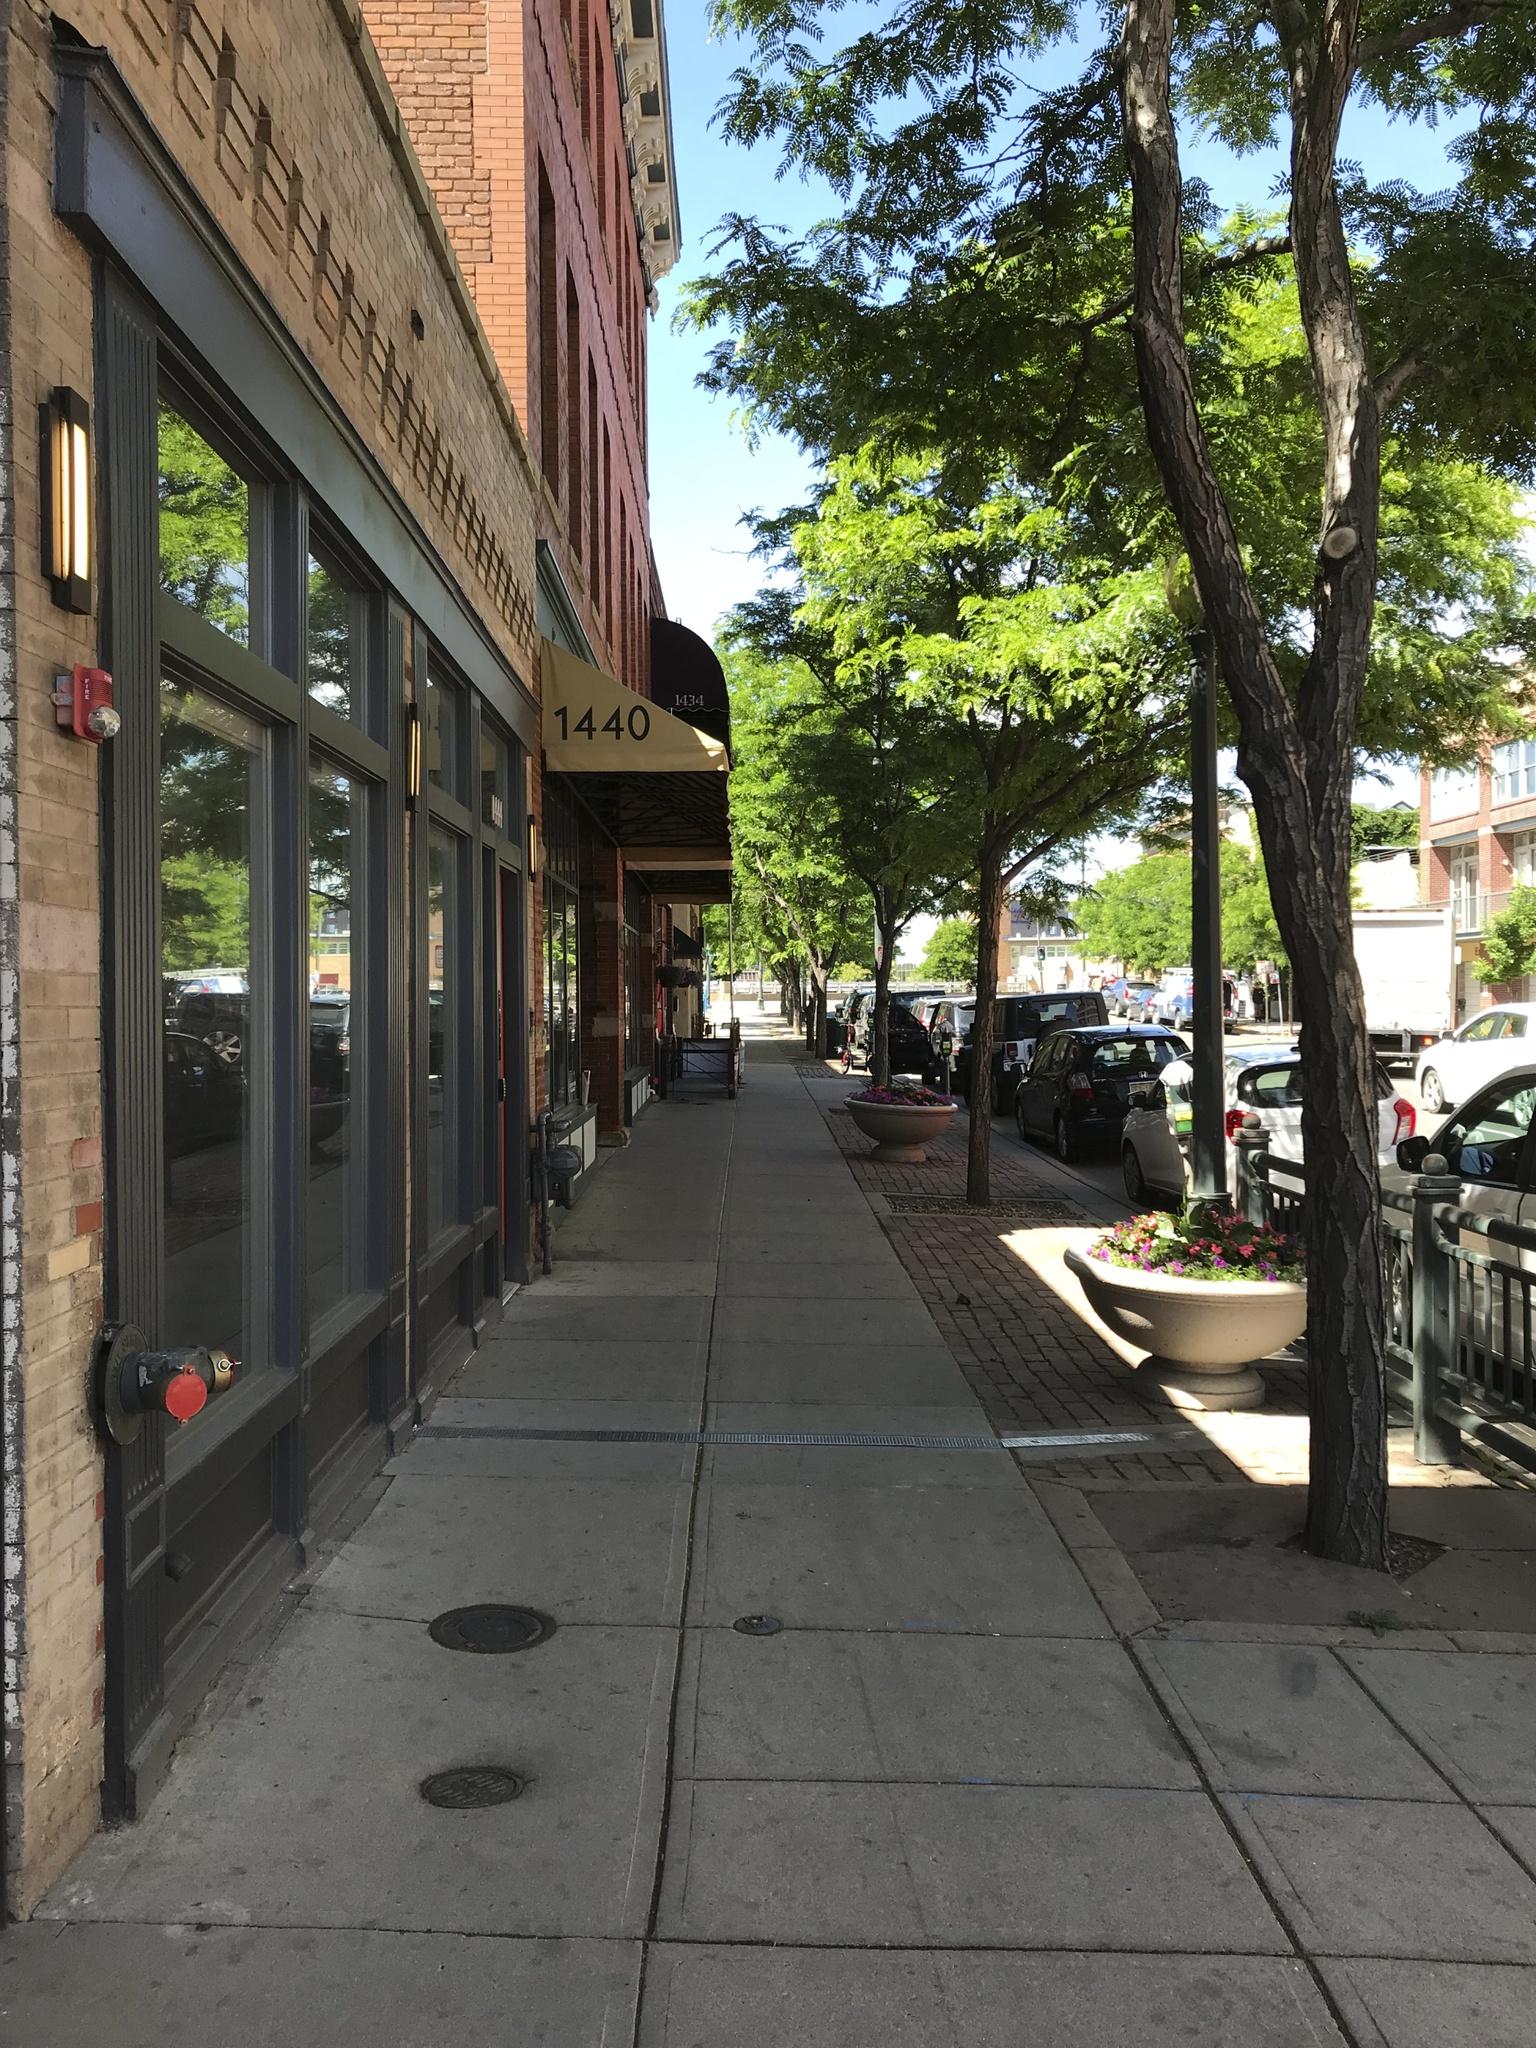 1440 Blake Street, Unit 150